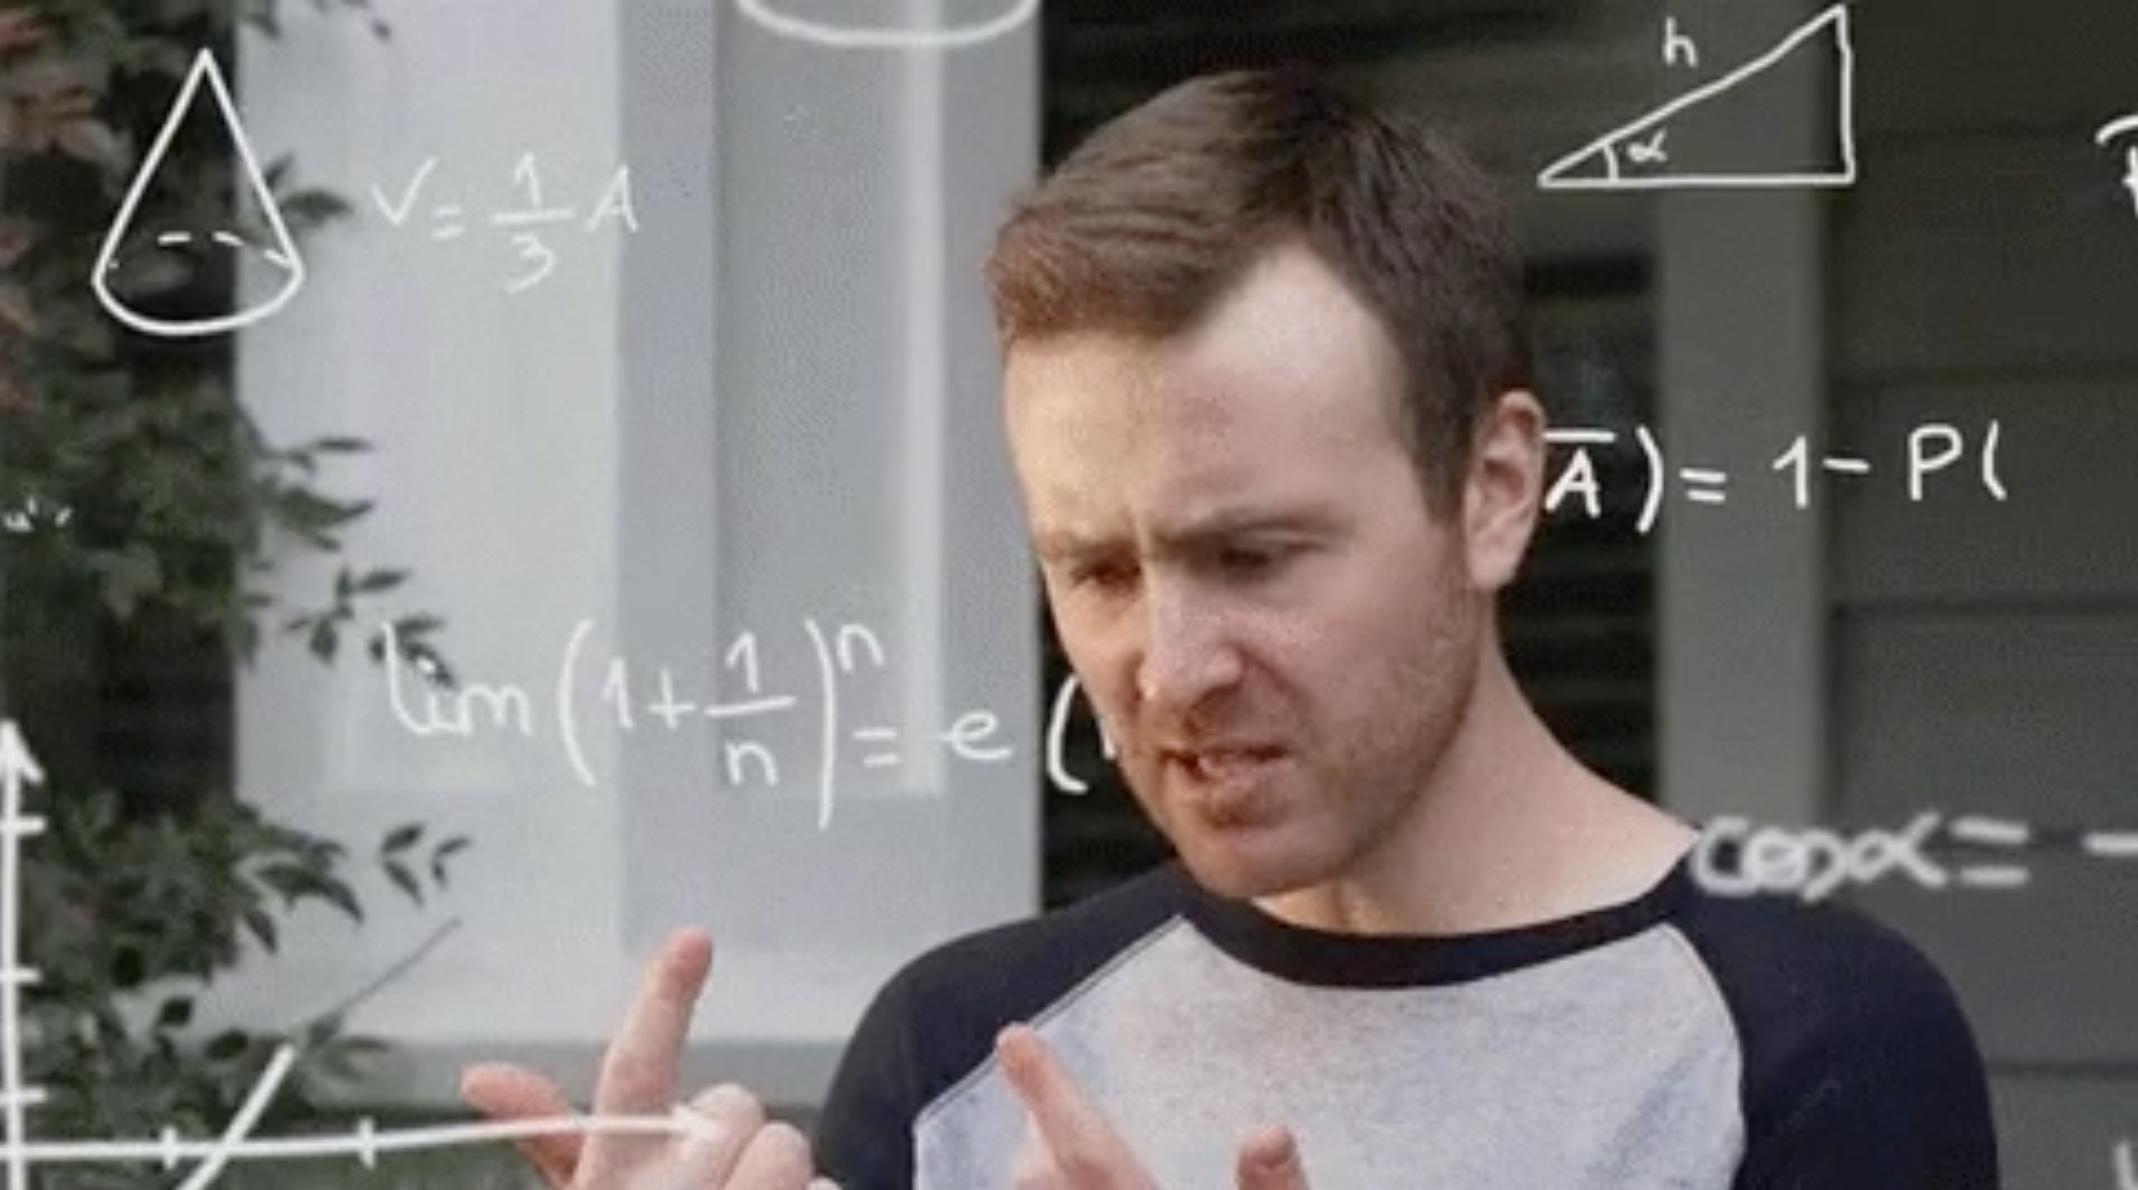 Hombre calculando